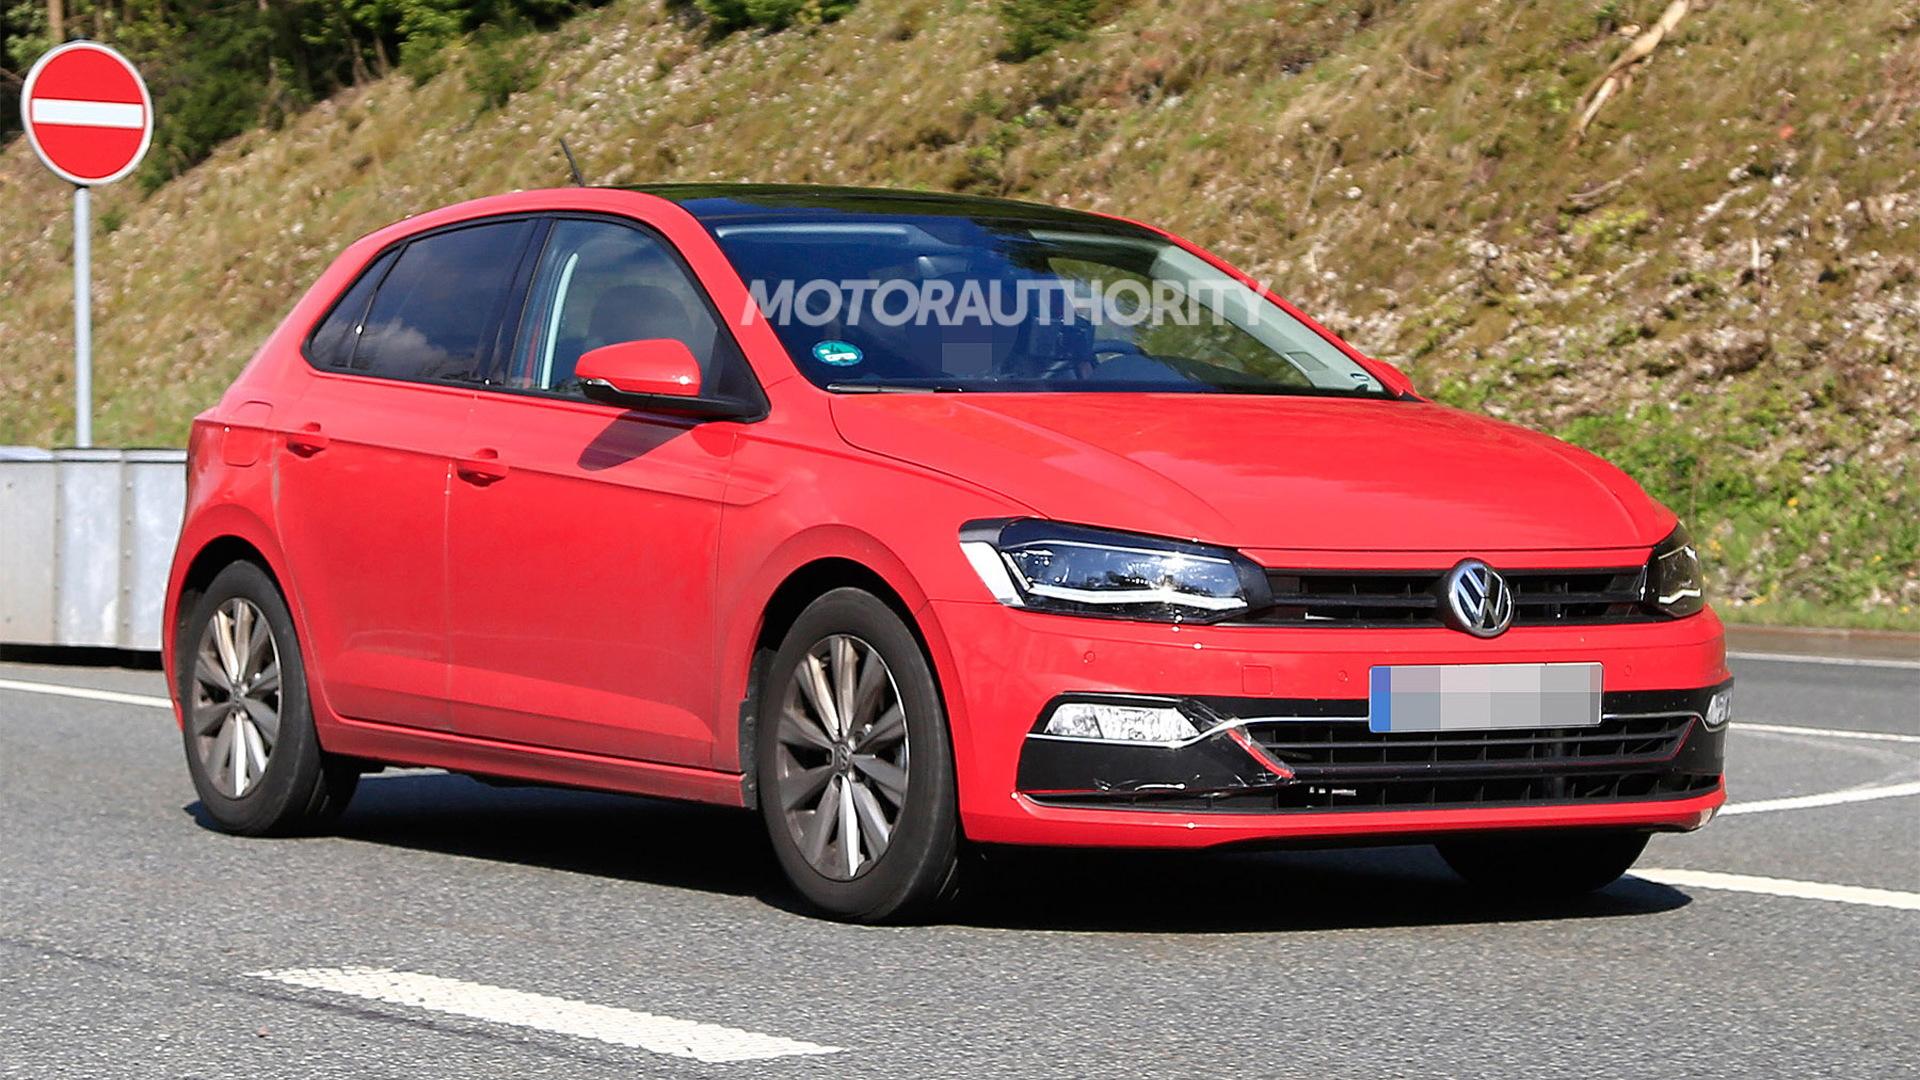 2018 Volkswagen Polo spy shots - Image via S. Baldauf/SB-Medien